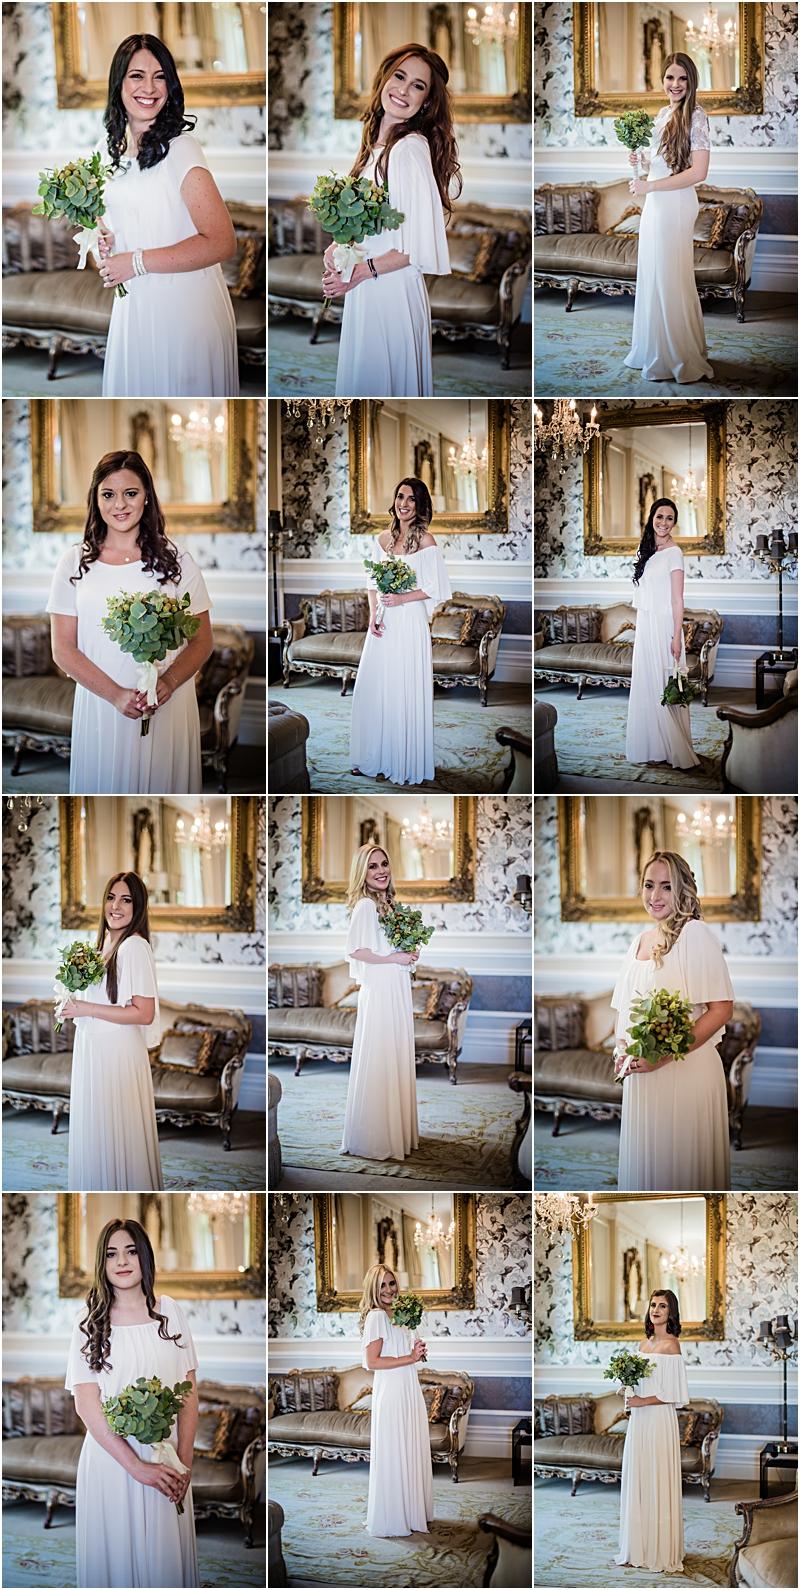 Best wedding photographer - AlexanderSmith_5344.jpg